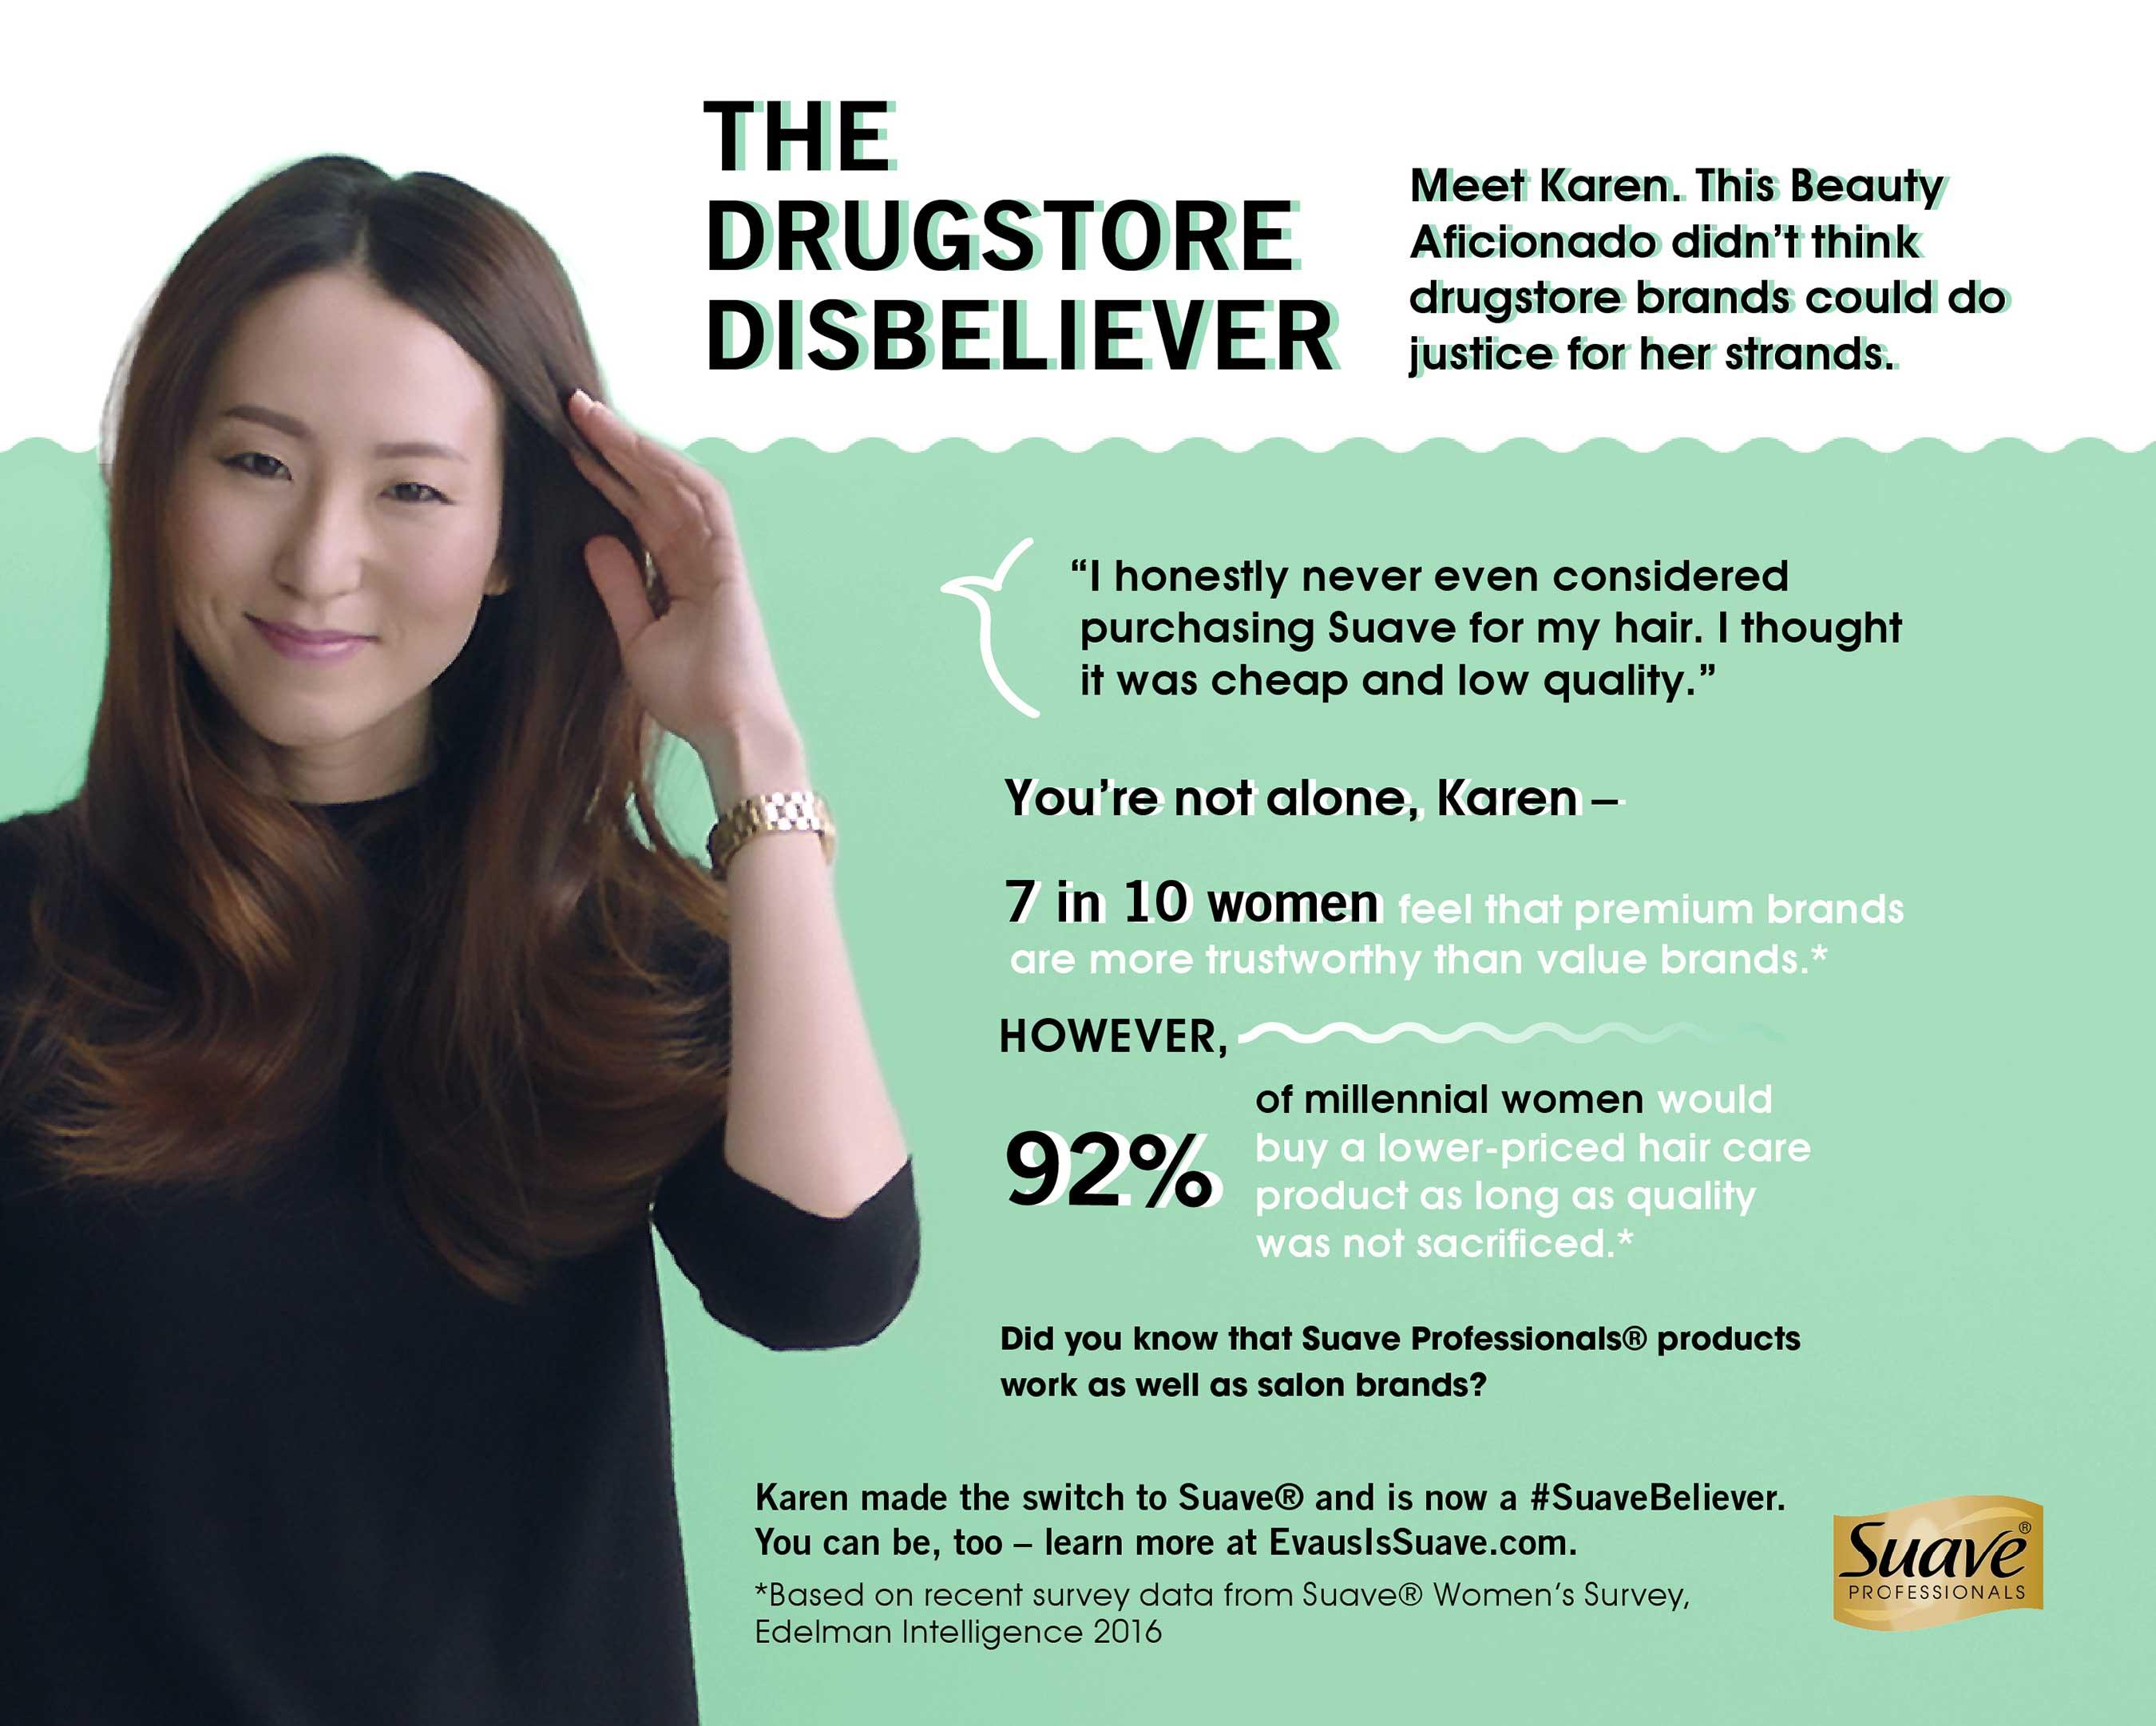 Suave's Drugstore Disbeliever Ad